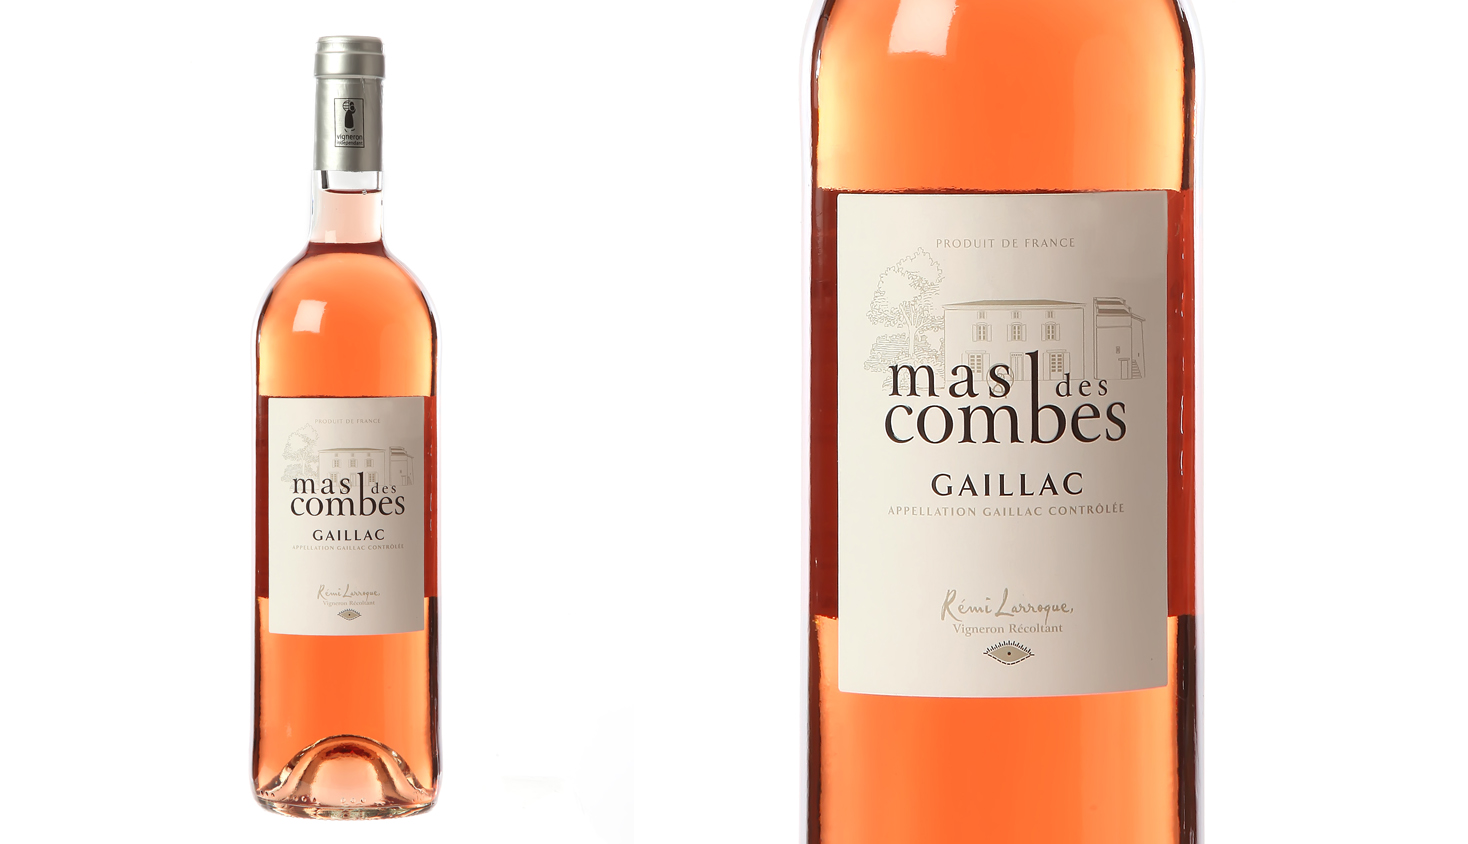 mas_des_combes_rosé_vins_de_gaillac1.jpg